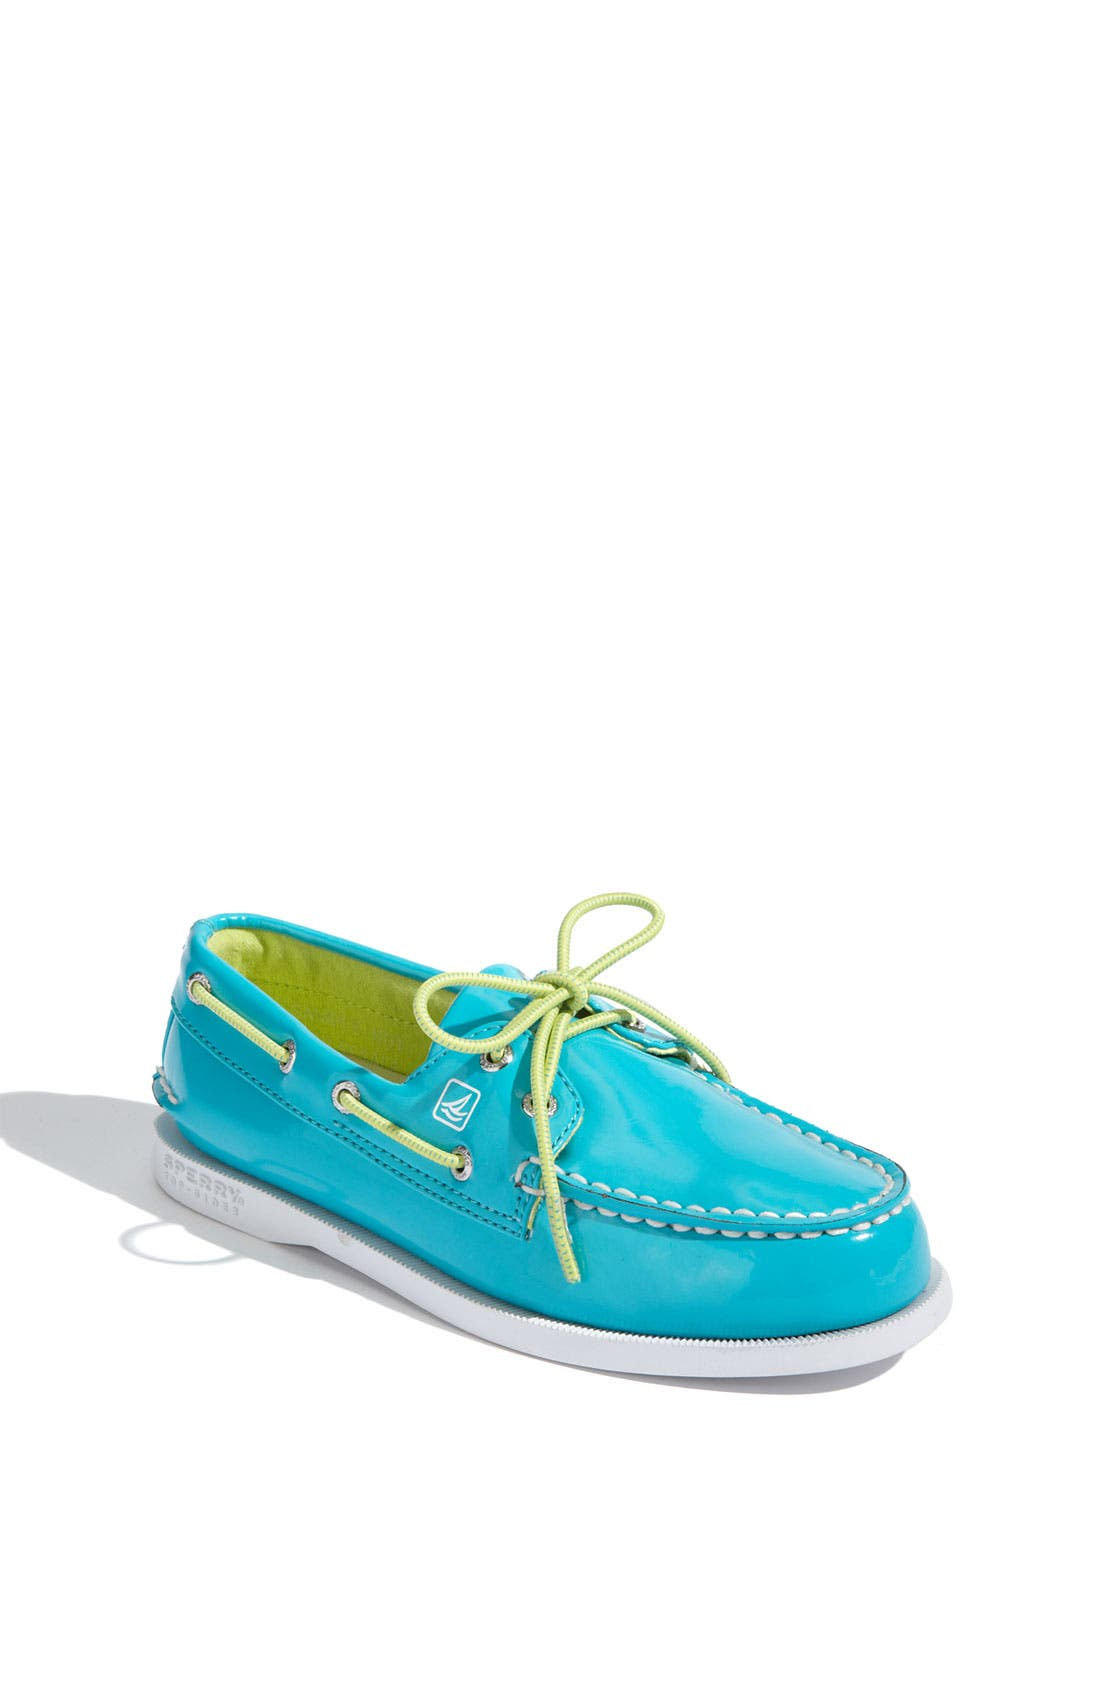 Main Image - Sperry Top-Sider® 'Authentic Original' Boat Shoe (Walker, Toddler, Little Kid & Big Kid)